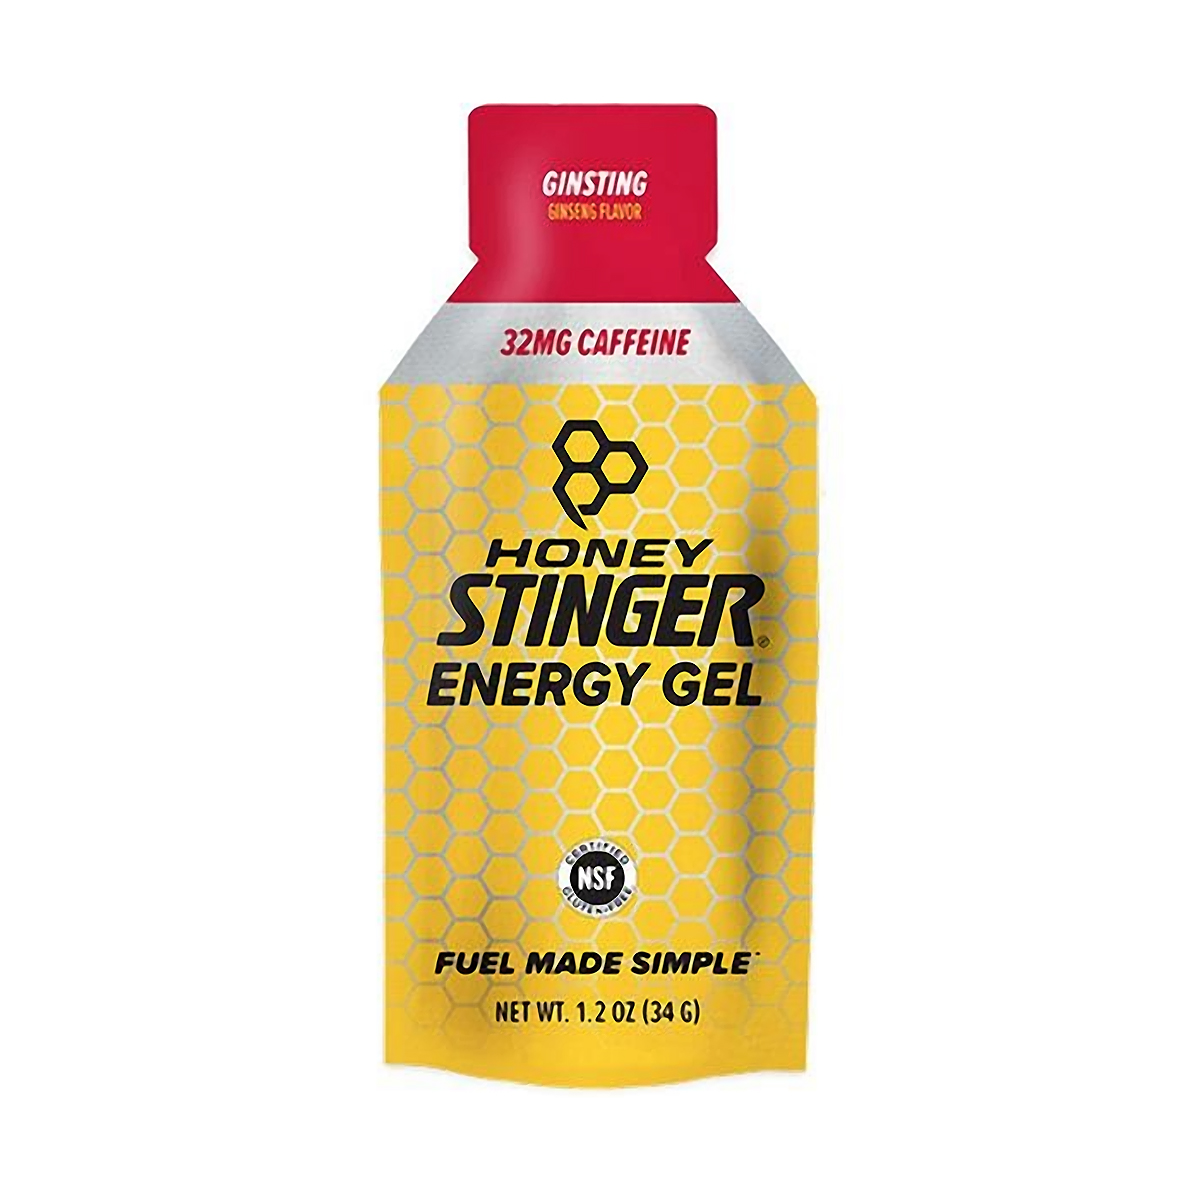 Honey Stinger Energy Gel - Flavor: Ginsting + Caffeine - Size: Box of 24, Caffeinated Ginsting, large, image 1